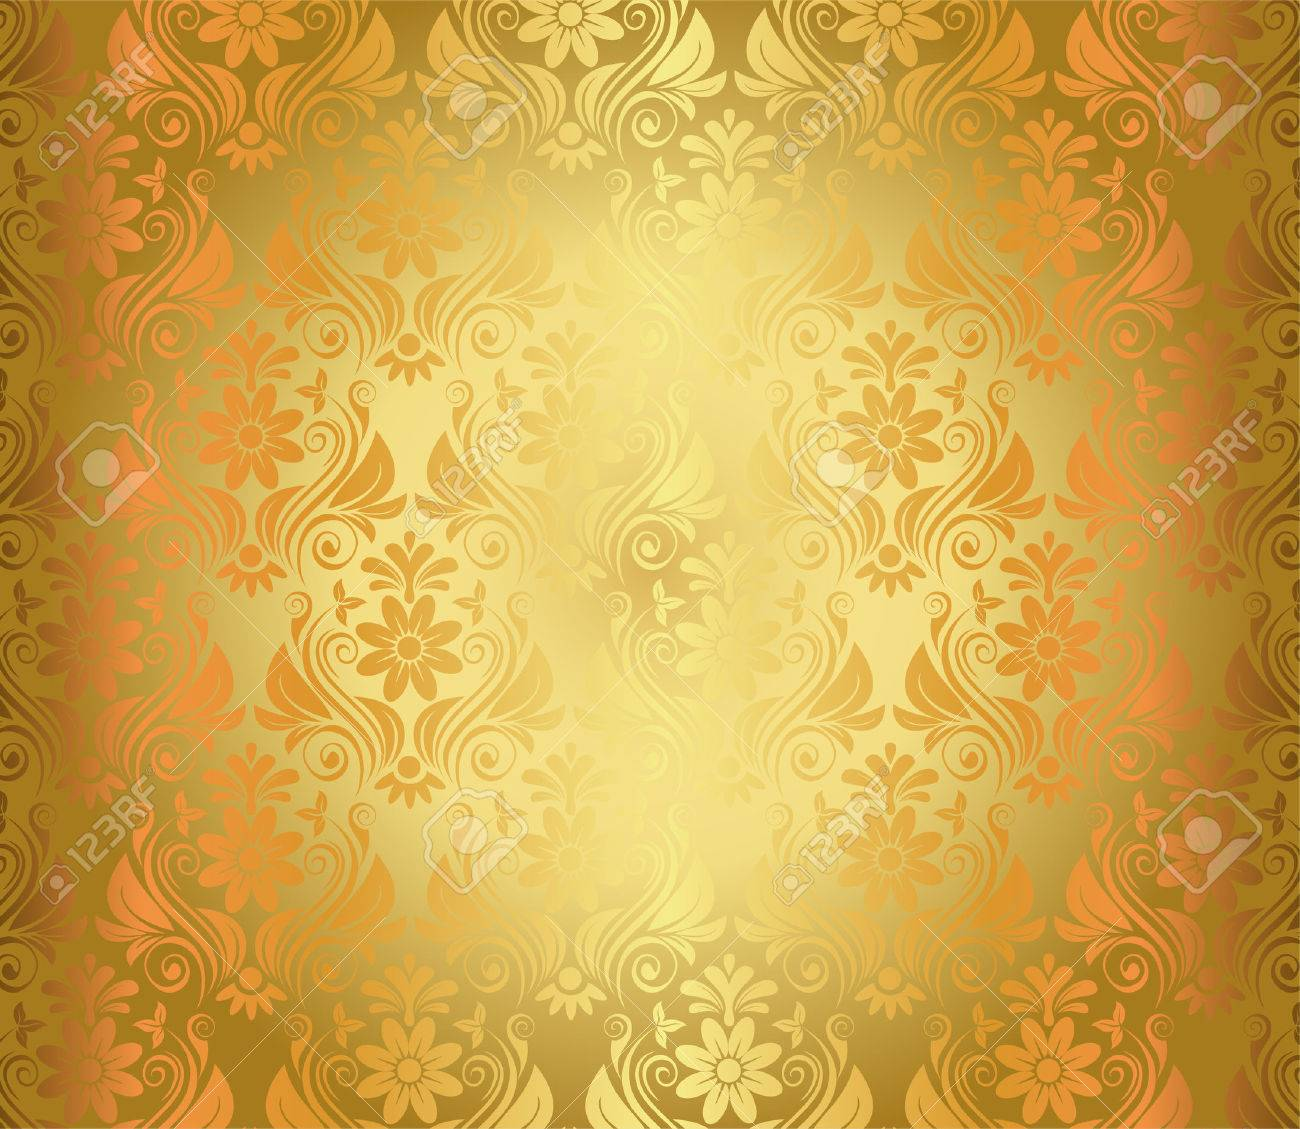 Luxury Seamless Golden Floral Wallpaper Vector Stock